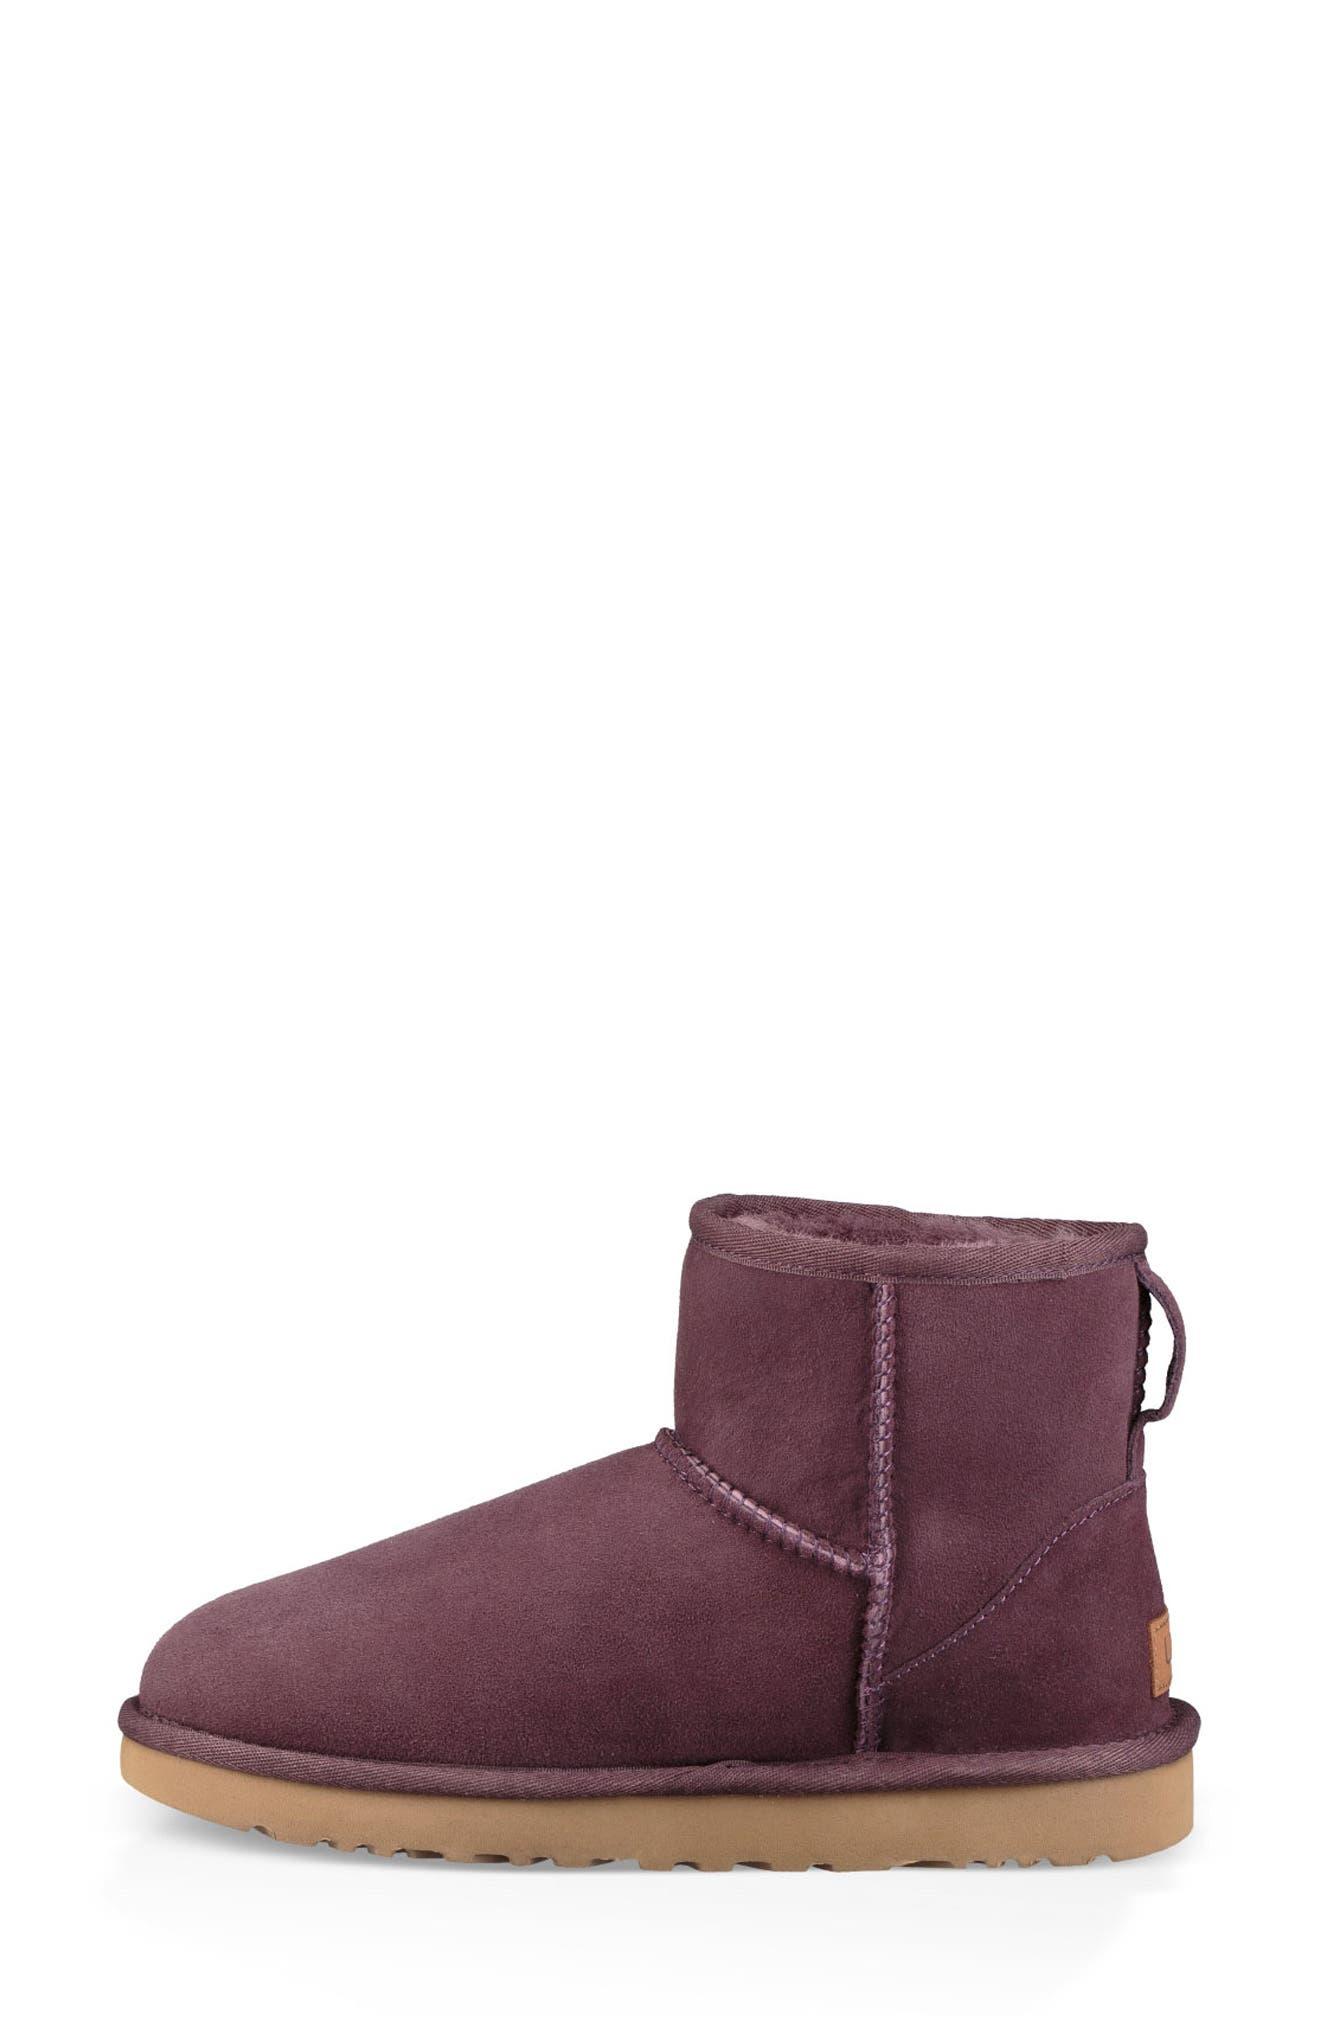 ,                             Classic Mini II Genuine Shearling Lined Boot,                             Alternate thumbnail 68, color,                             553